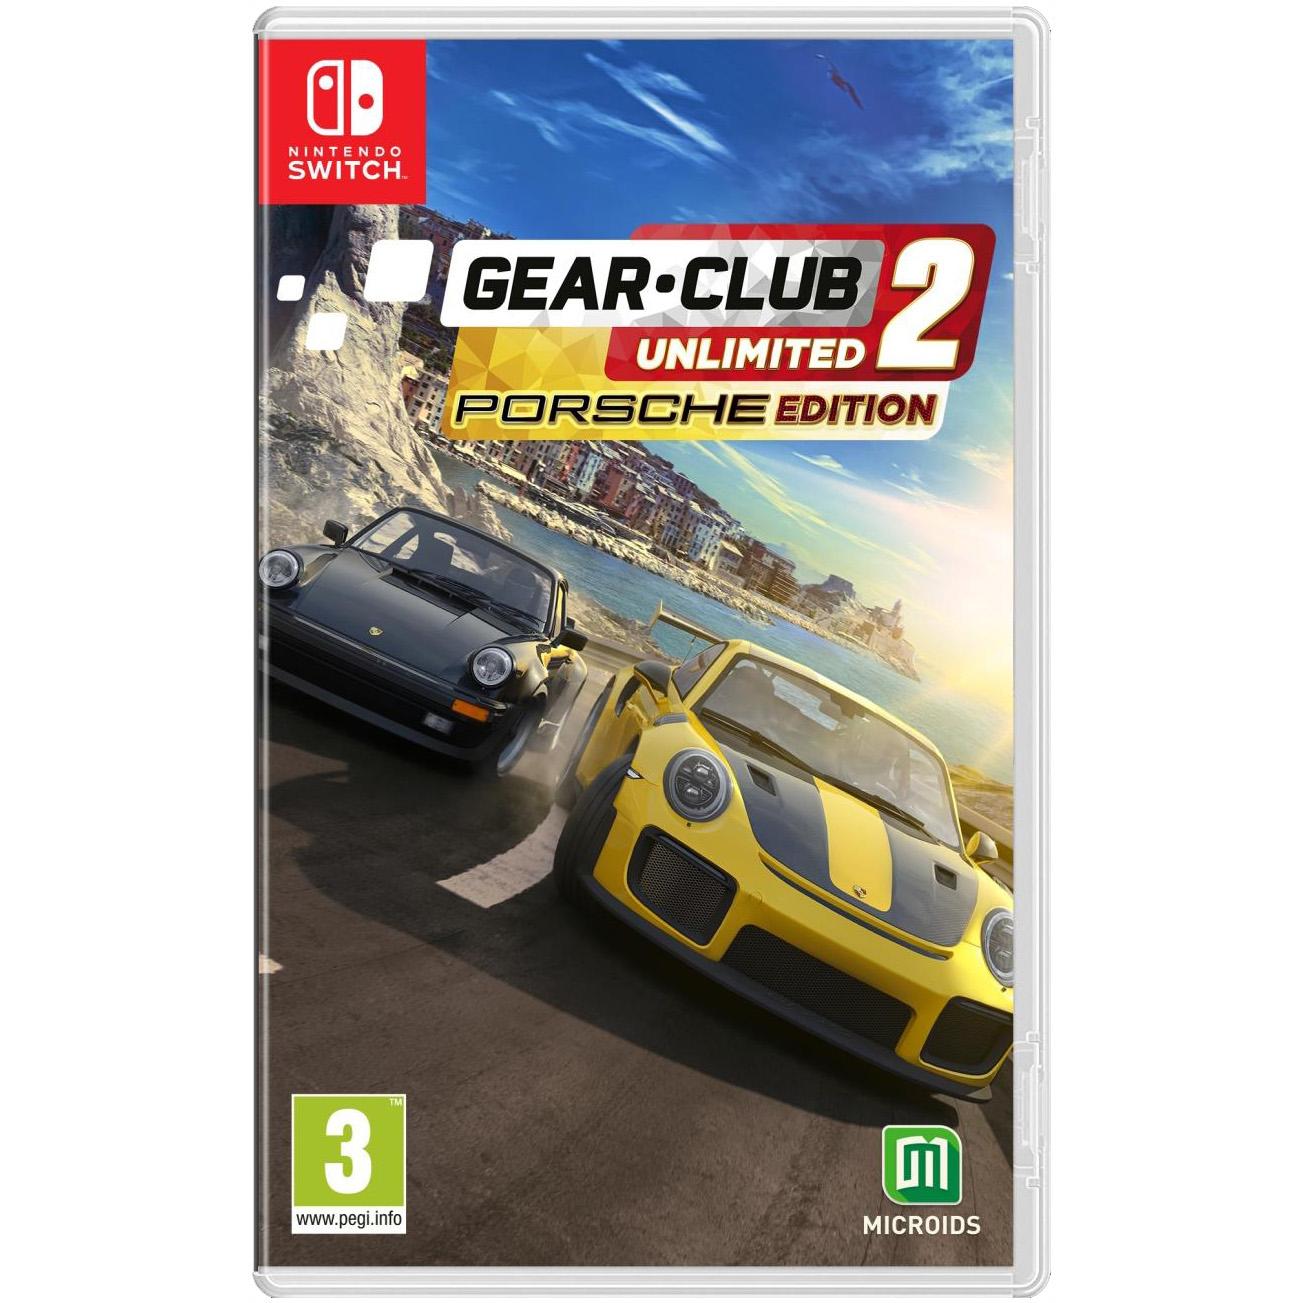 Joc Gear Club Unlimited 2 Porsche Edition pentru Nintendo Switch 0